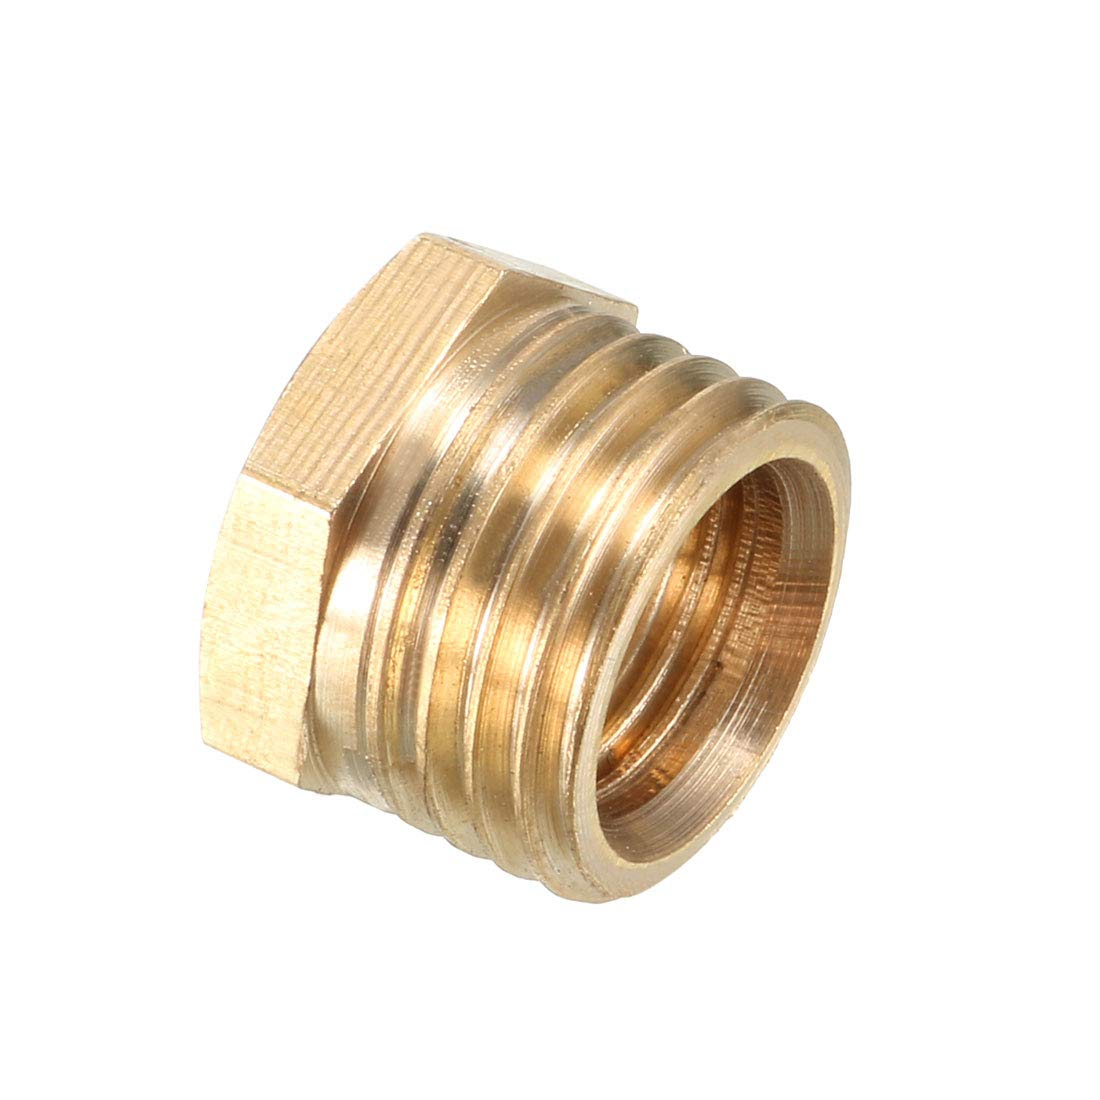 3//8 pulgadas extensi/ón de broca de v/ástago de aleaci/ón de acero de 1//4 pulgadas Sourcingmap Juego de adaptadores de vaso de impacto hexagonal 1//2 pulgadas